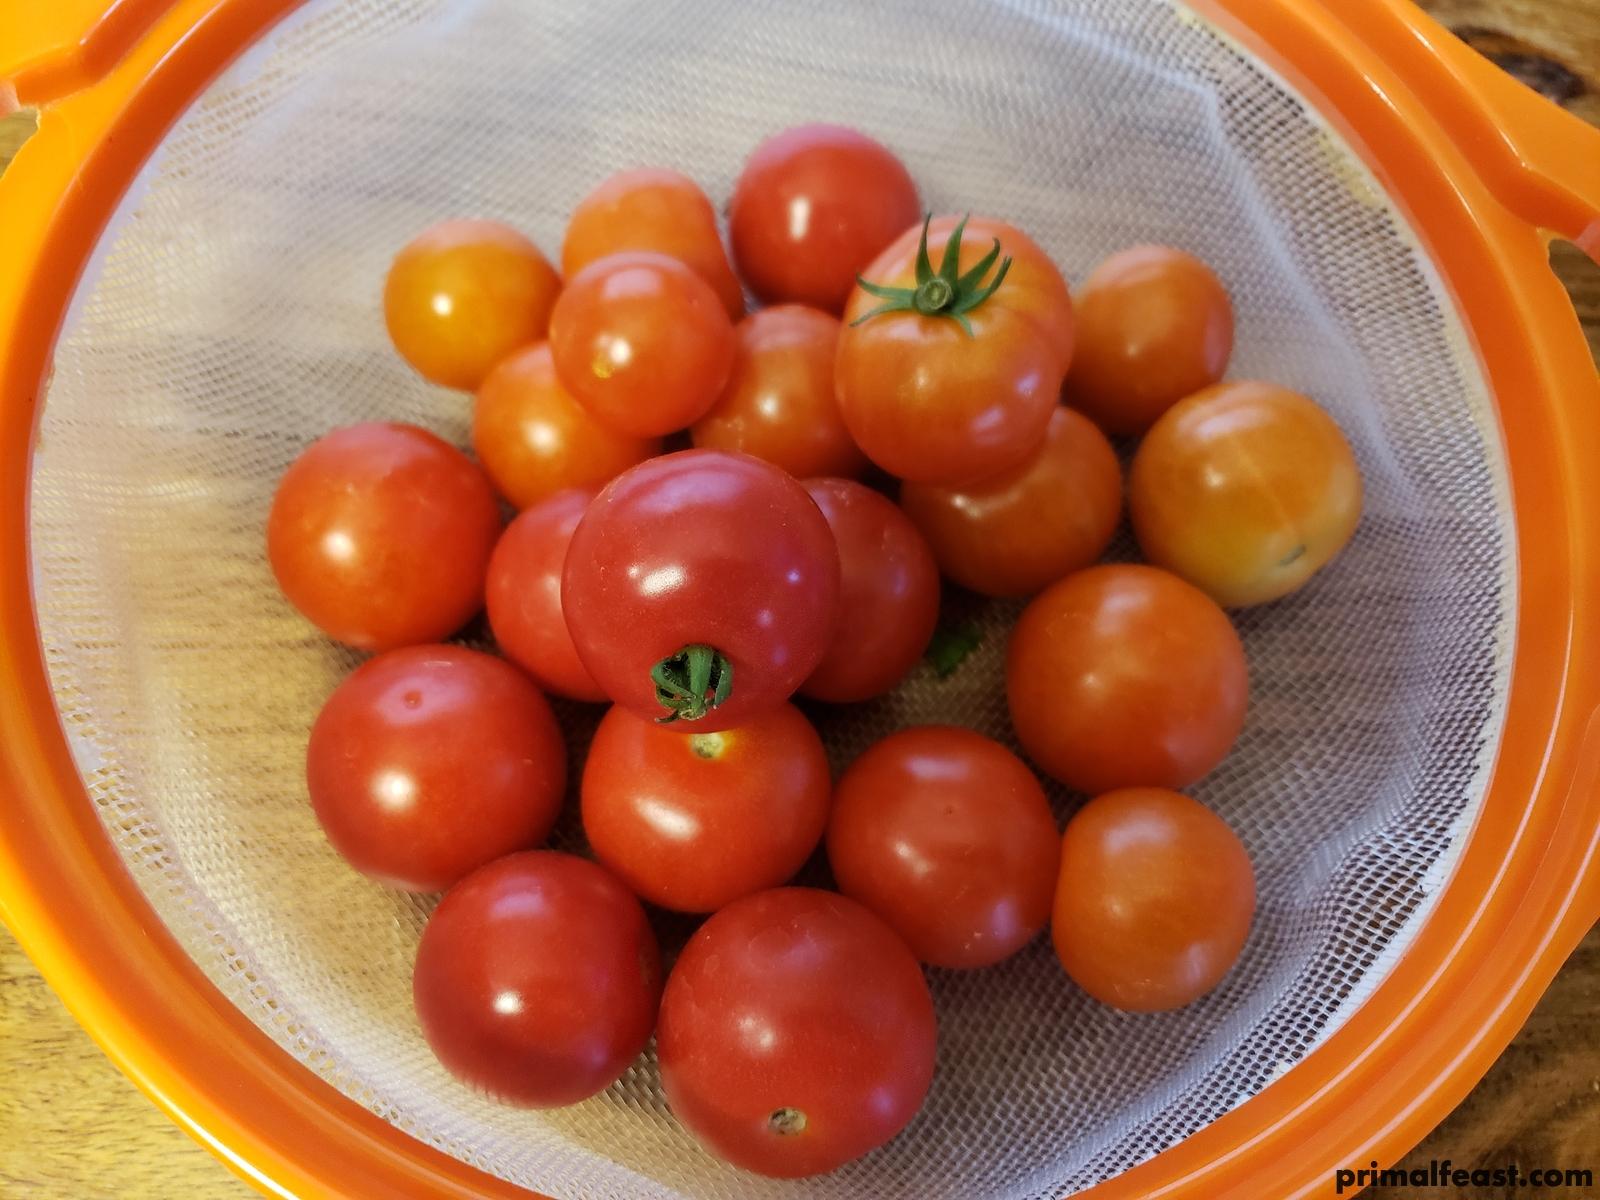 2018 0517 tomatoes 001.jpg